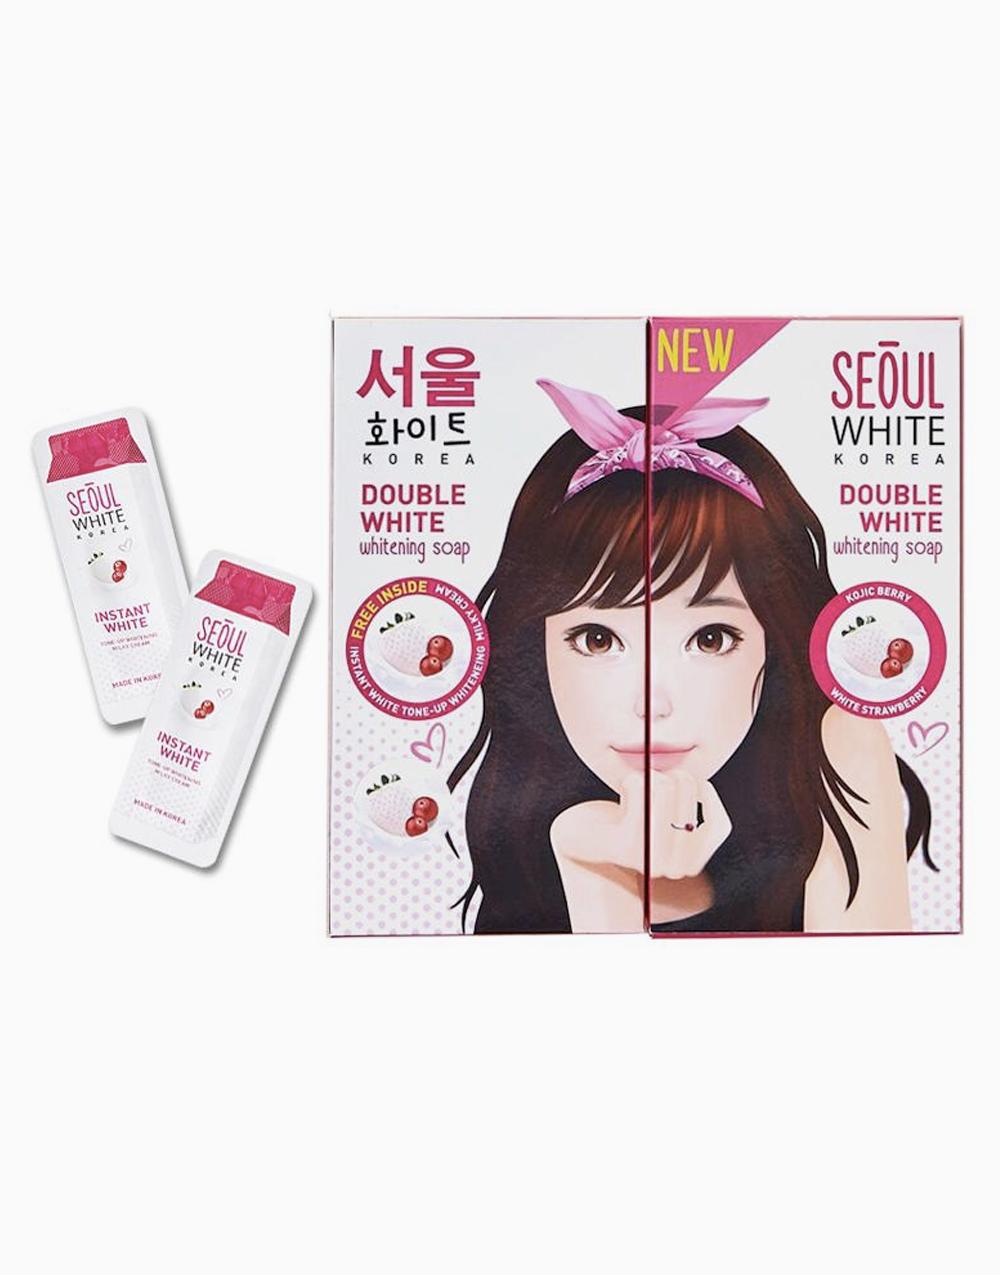 6x90g Whitening Soap FREE 2 sachets Tone-Up Cream by Seoul White Korea